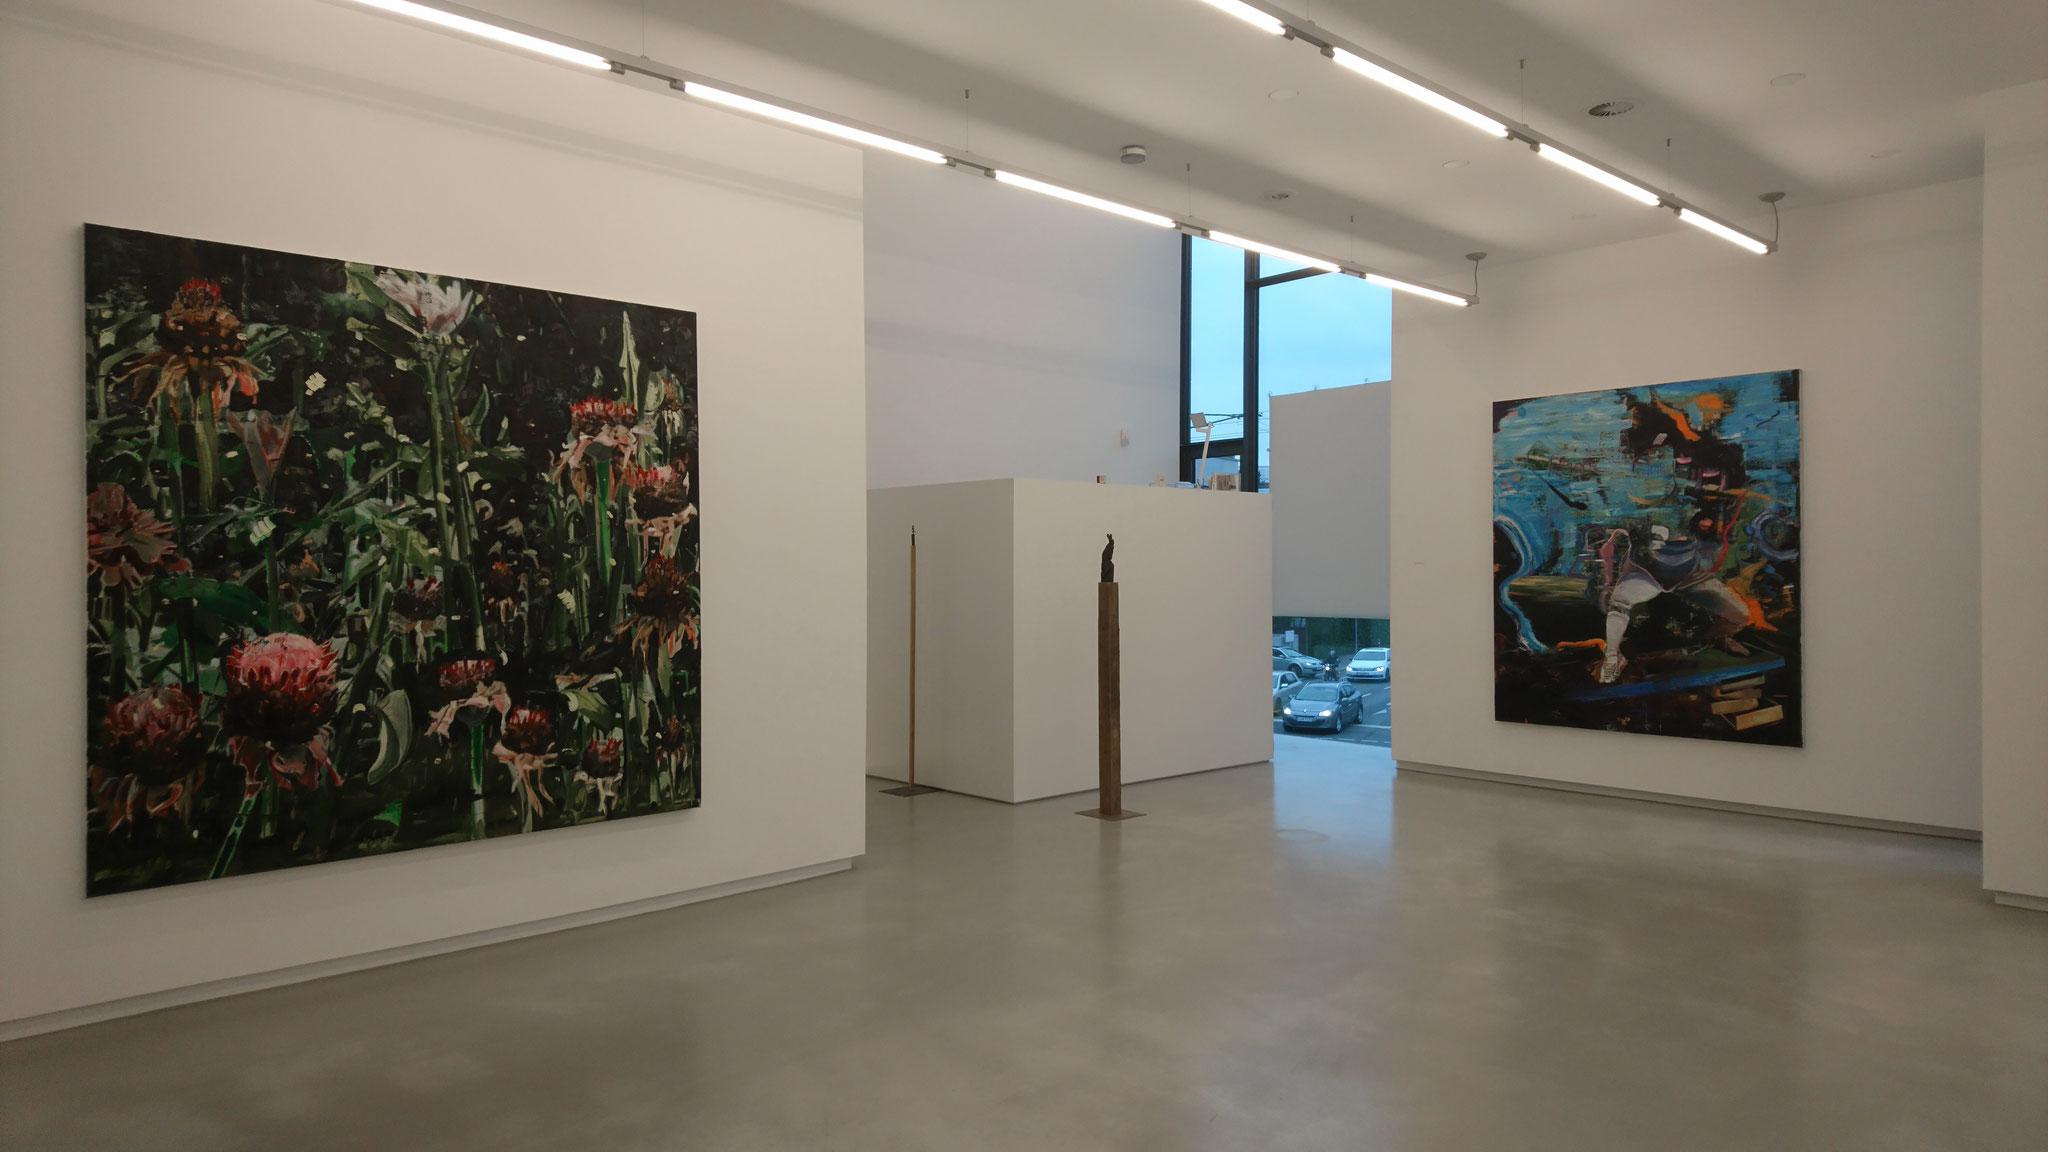 UND DANN PASSIERT SOWAS |  Galerie Abtart | Anna Bittersohl / Philipp Kummer / Christian Rösner